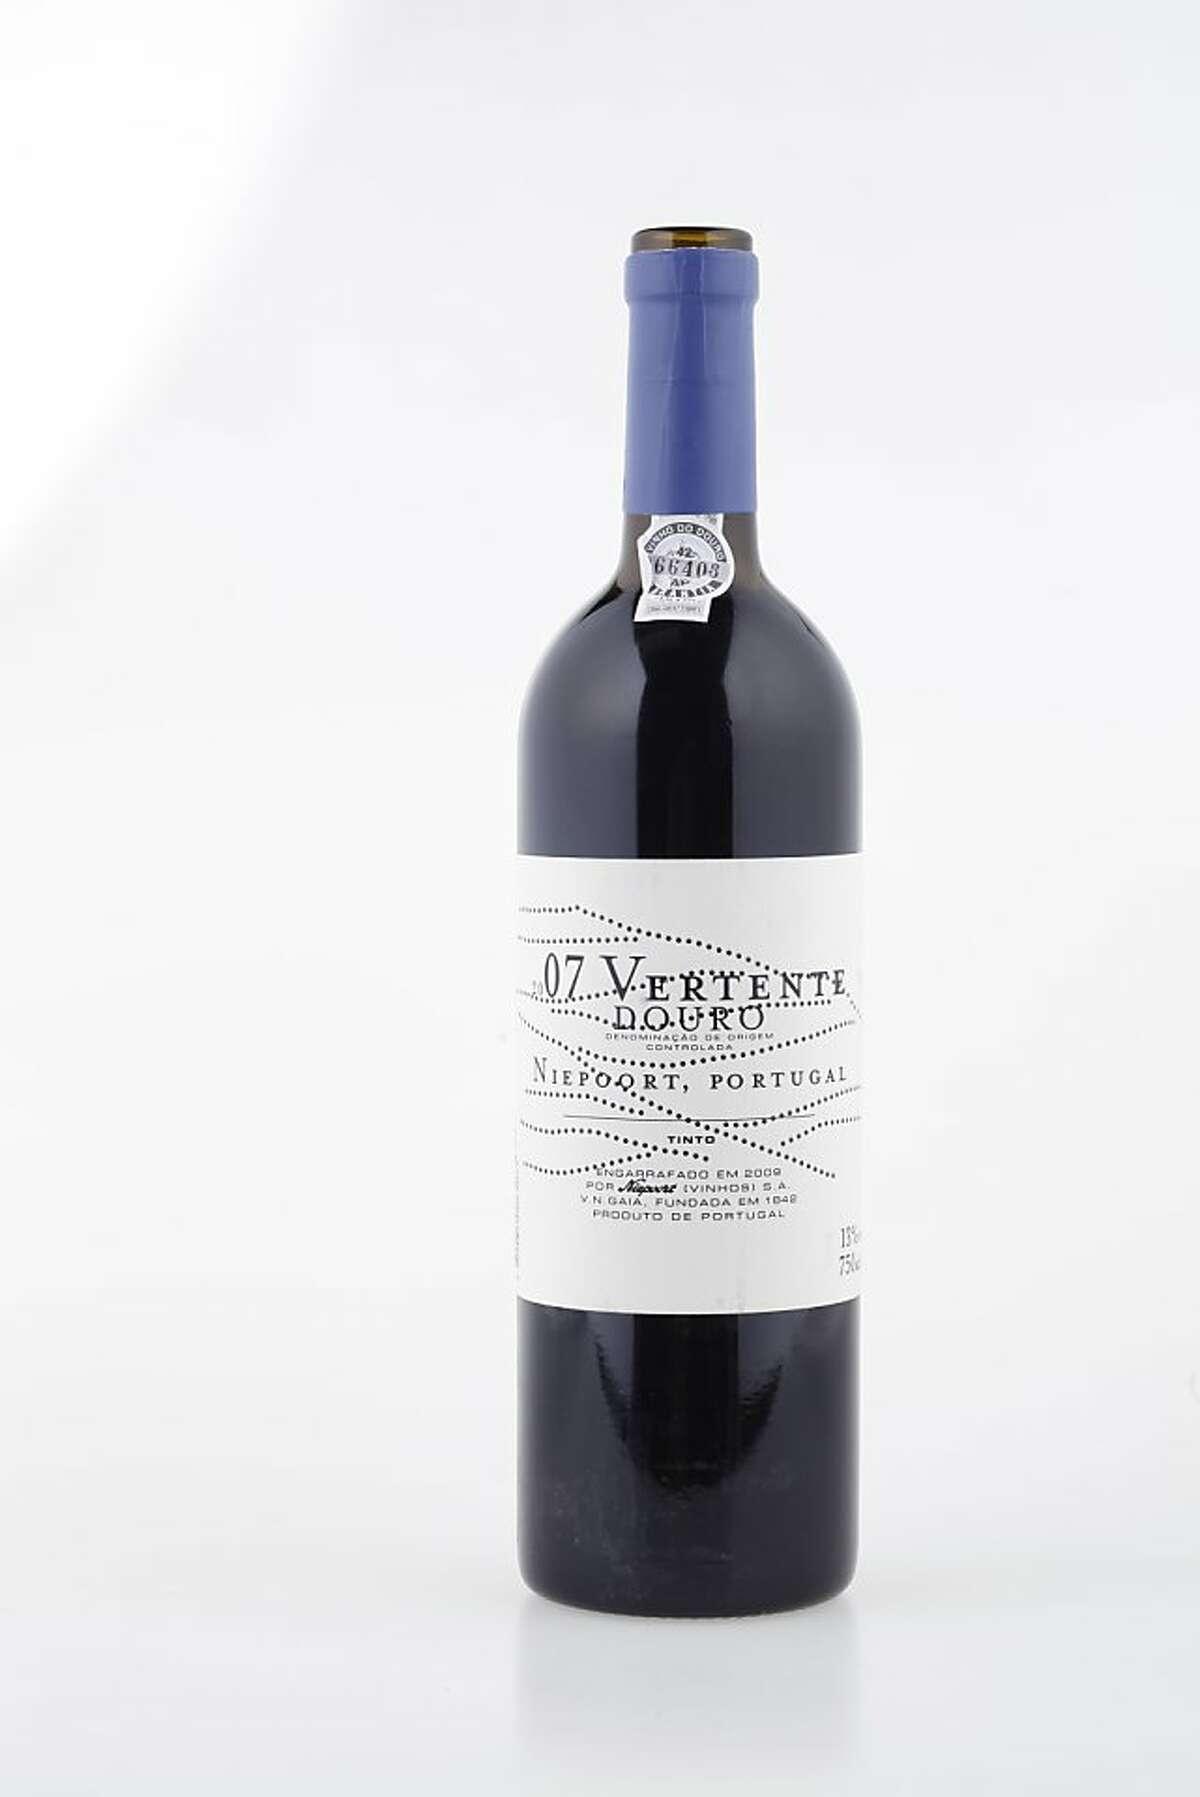 2007 Niepoort Vertente Douro Tinto ($30, 13%).